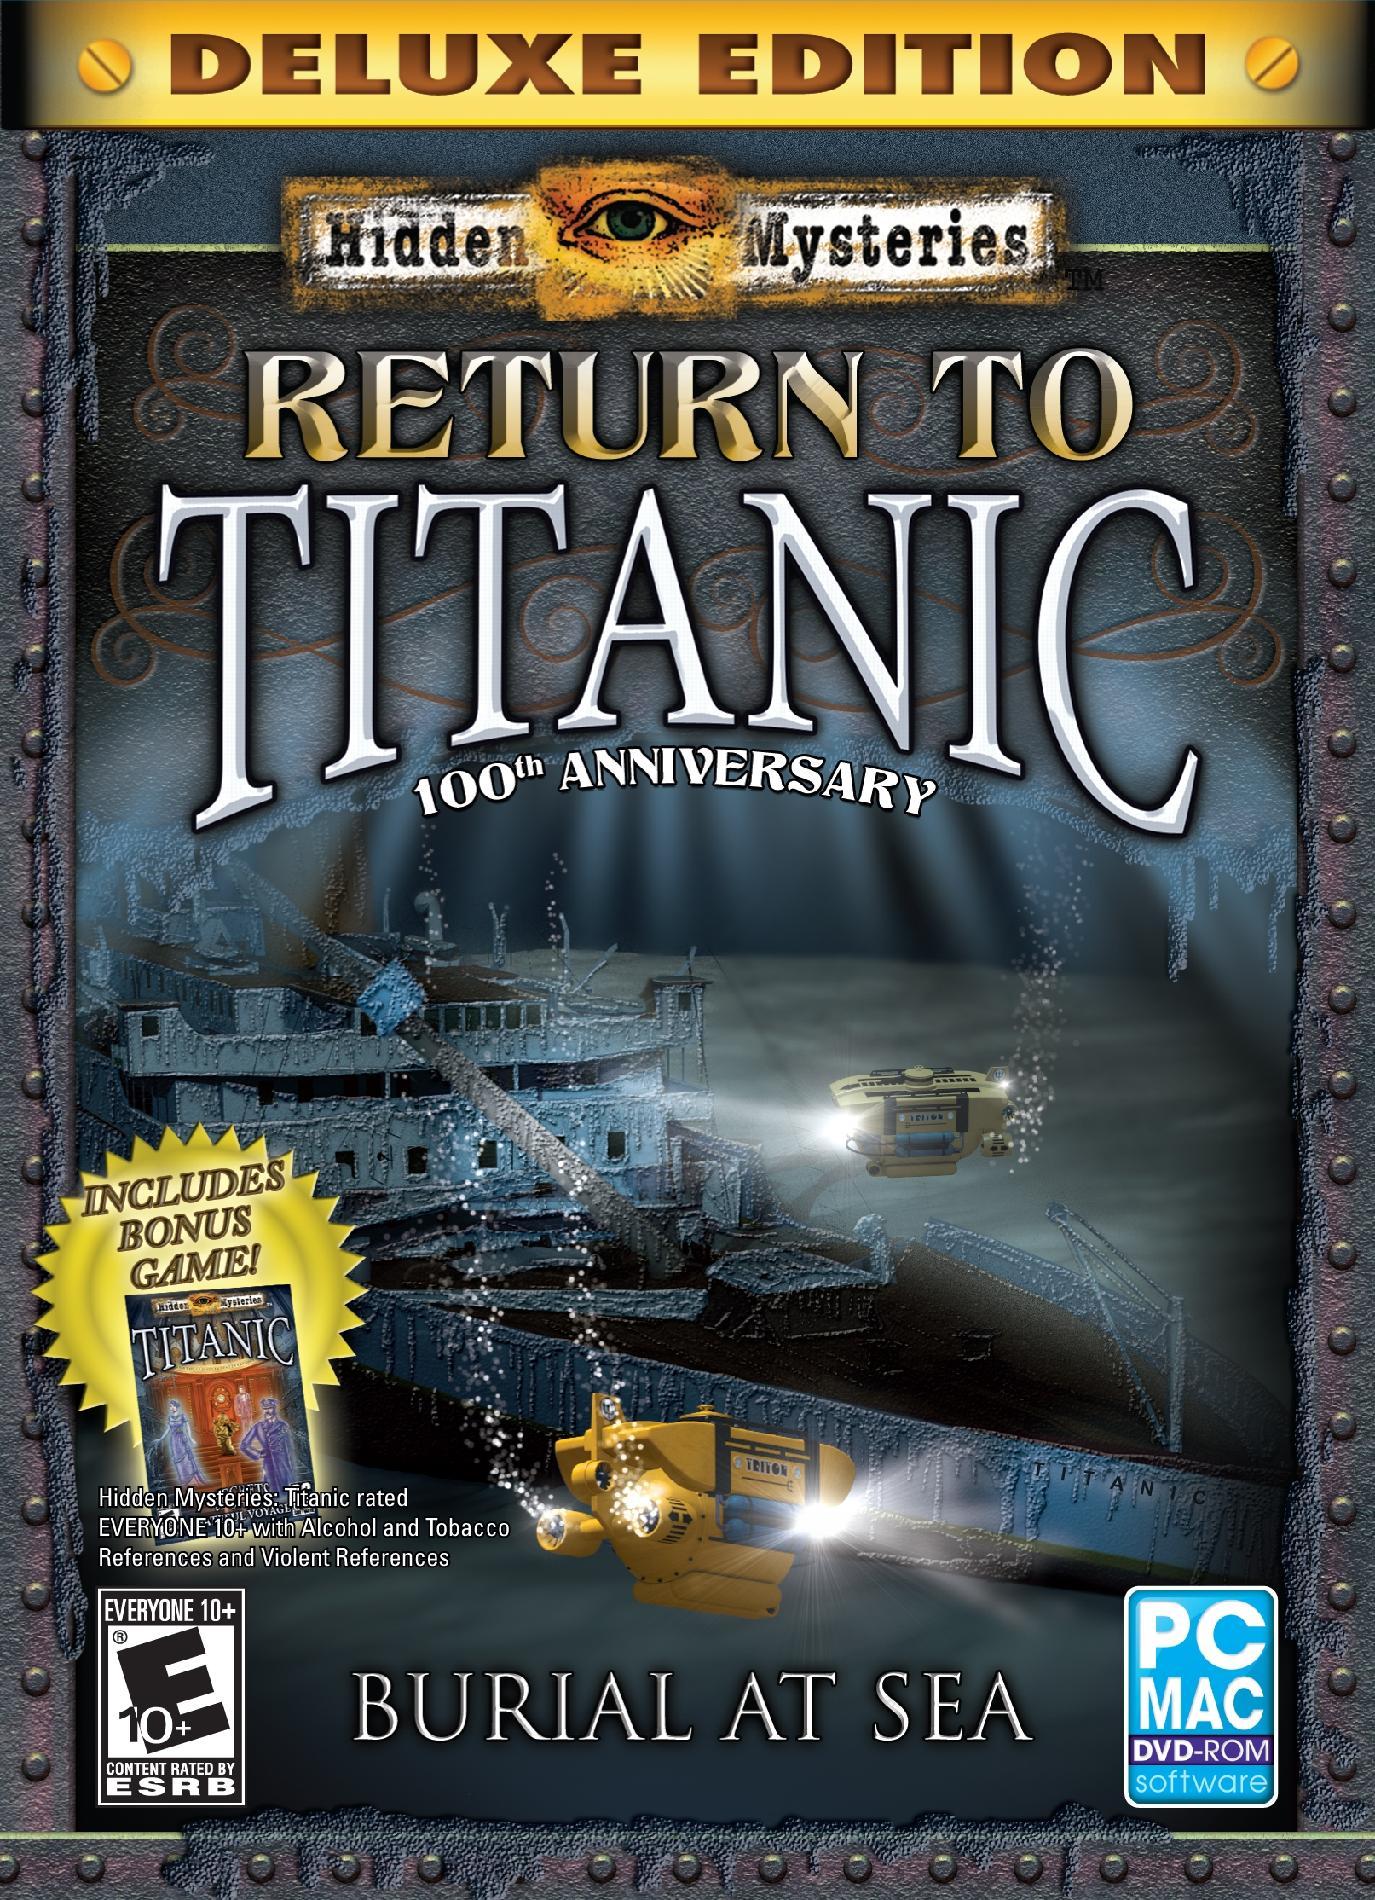 Encore HIDDEN MYSTERIES TITANIC 2 PartNumber: 05844821000P KsnValue: 7885386 MfgPartNumber: 8085582